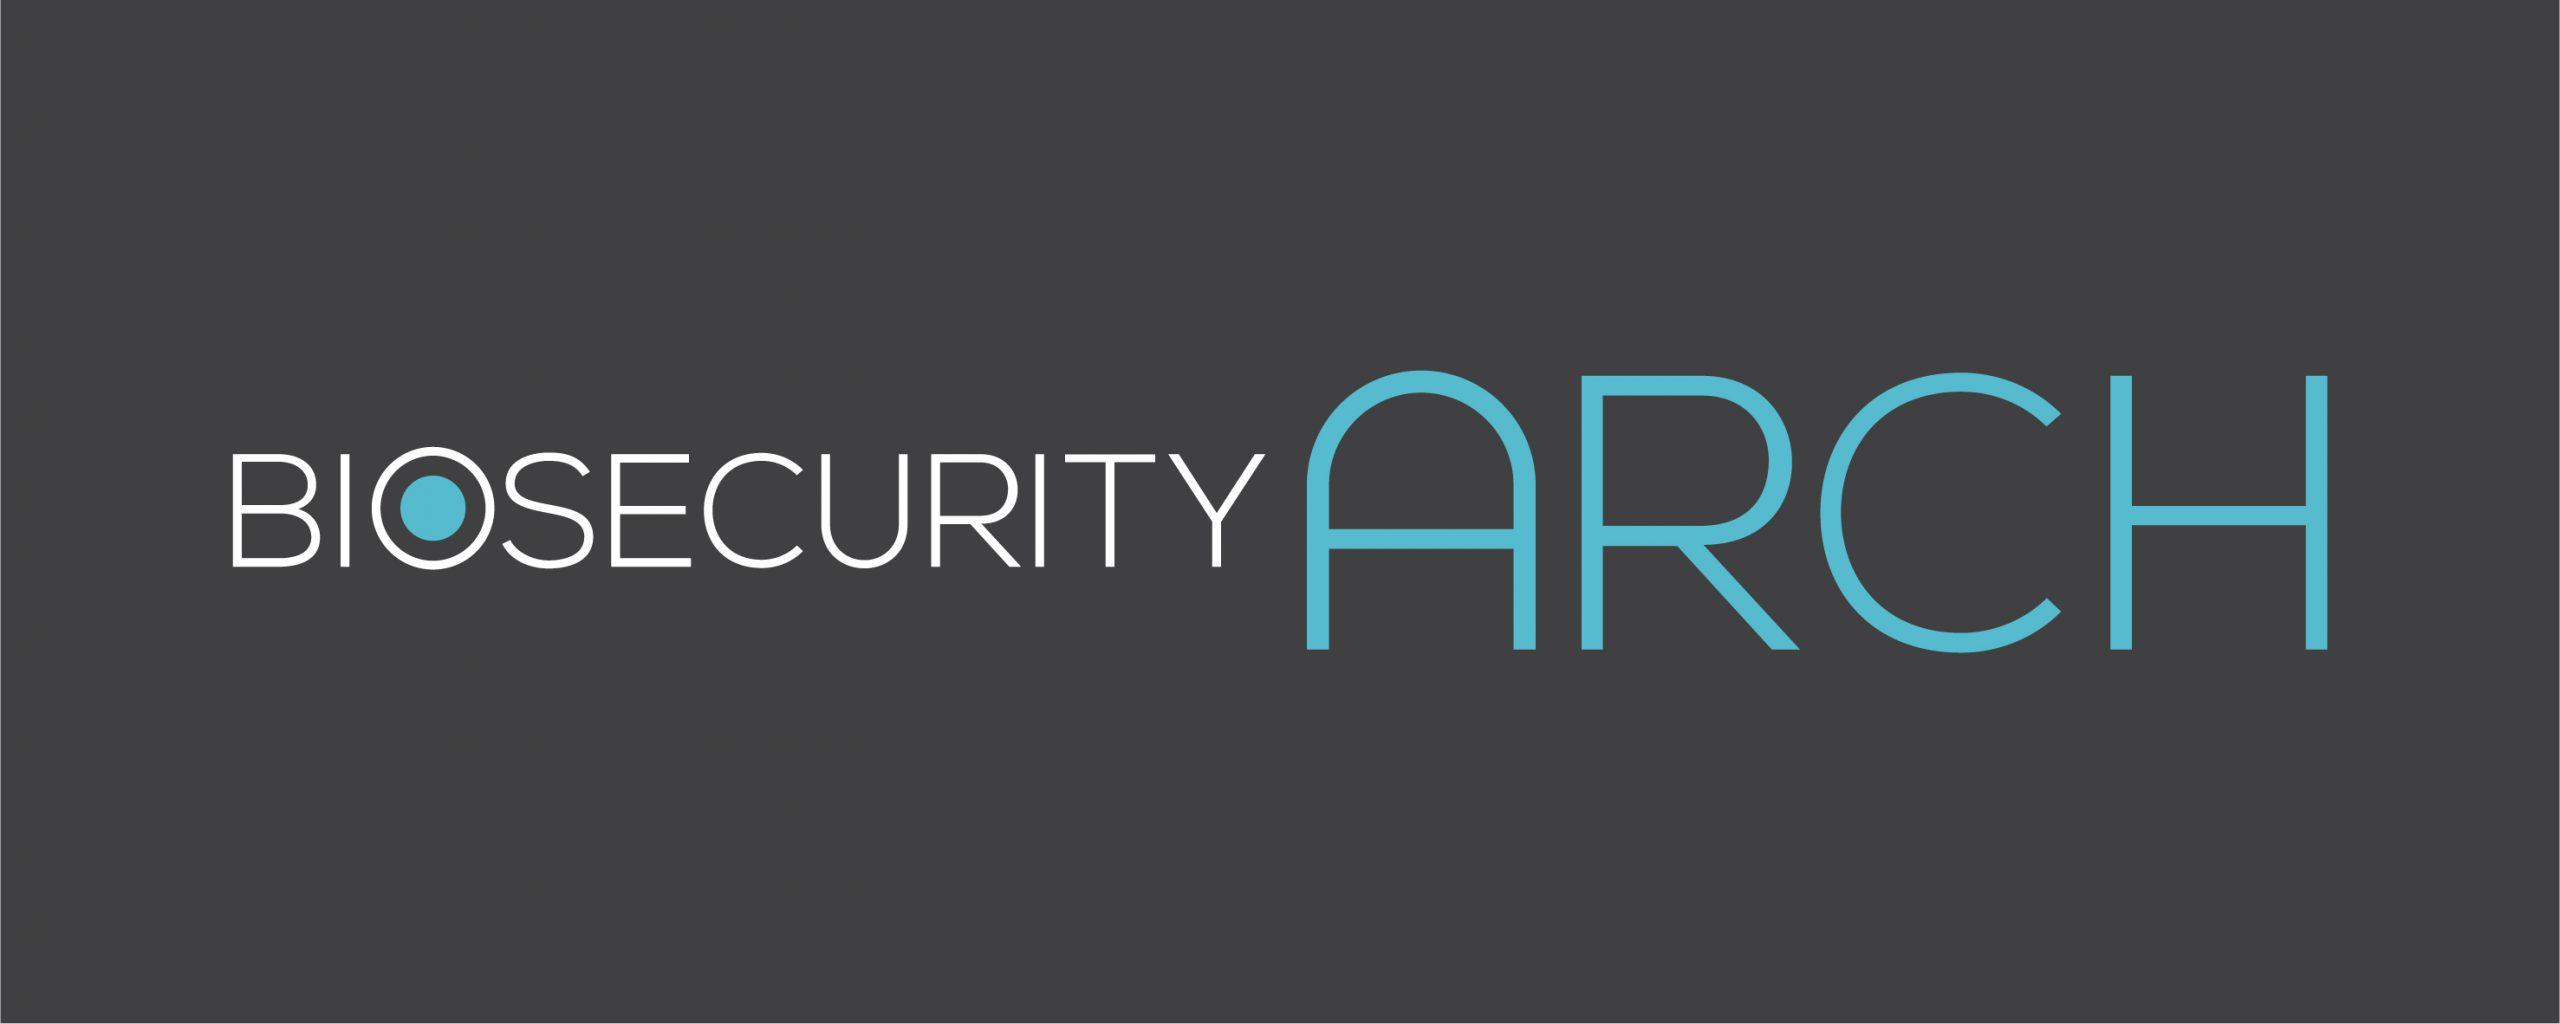 Biosecurity Arch